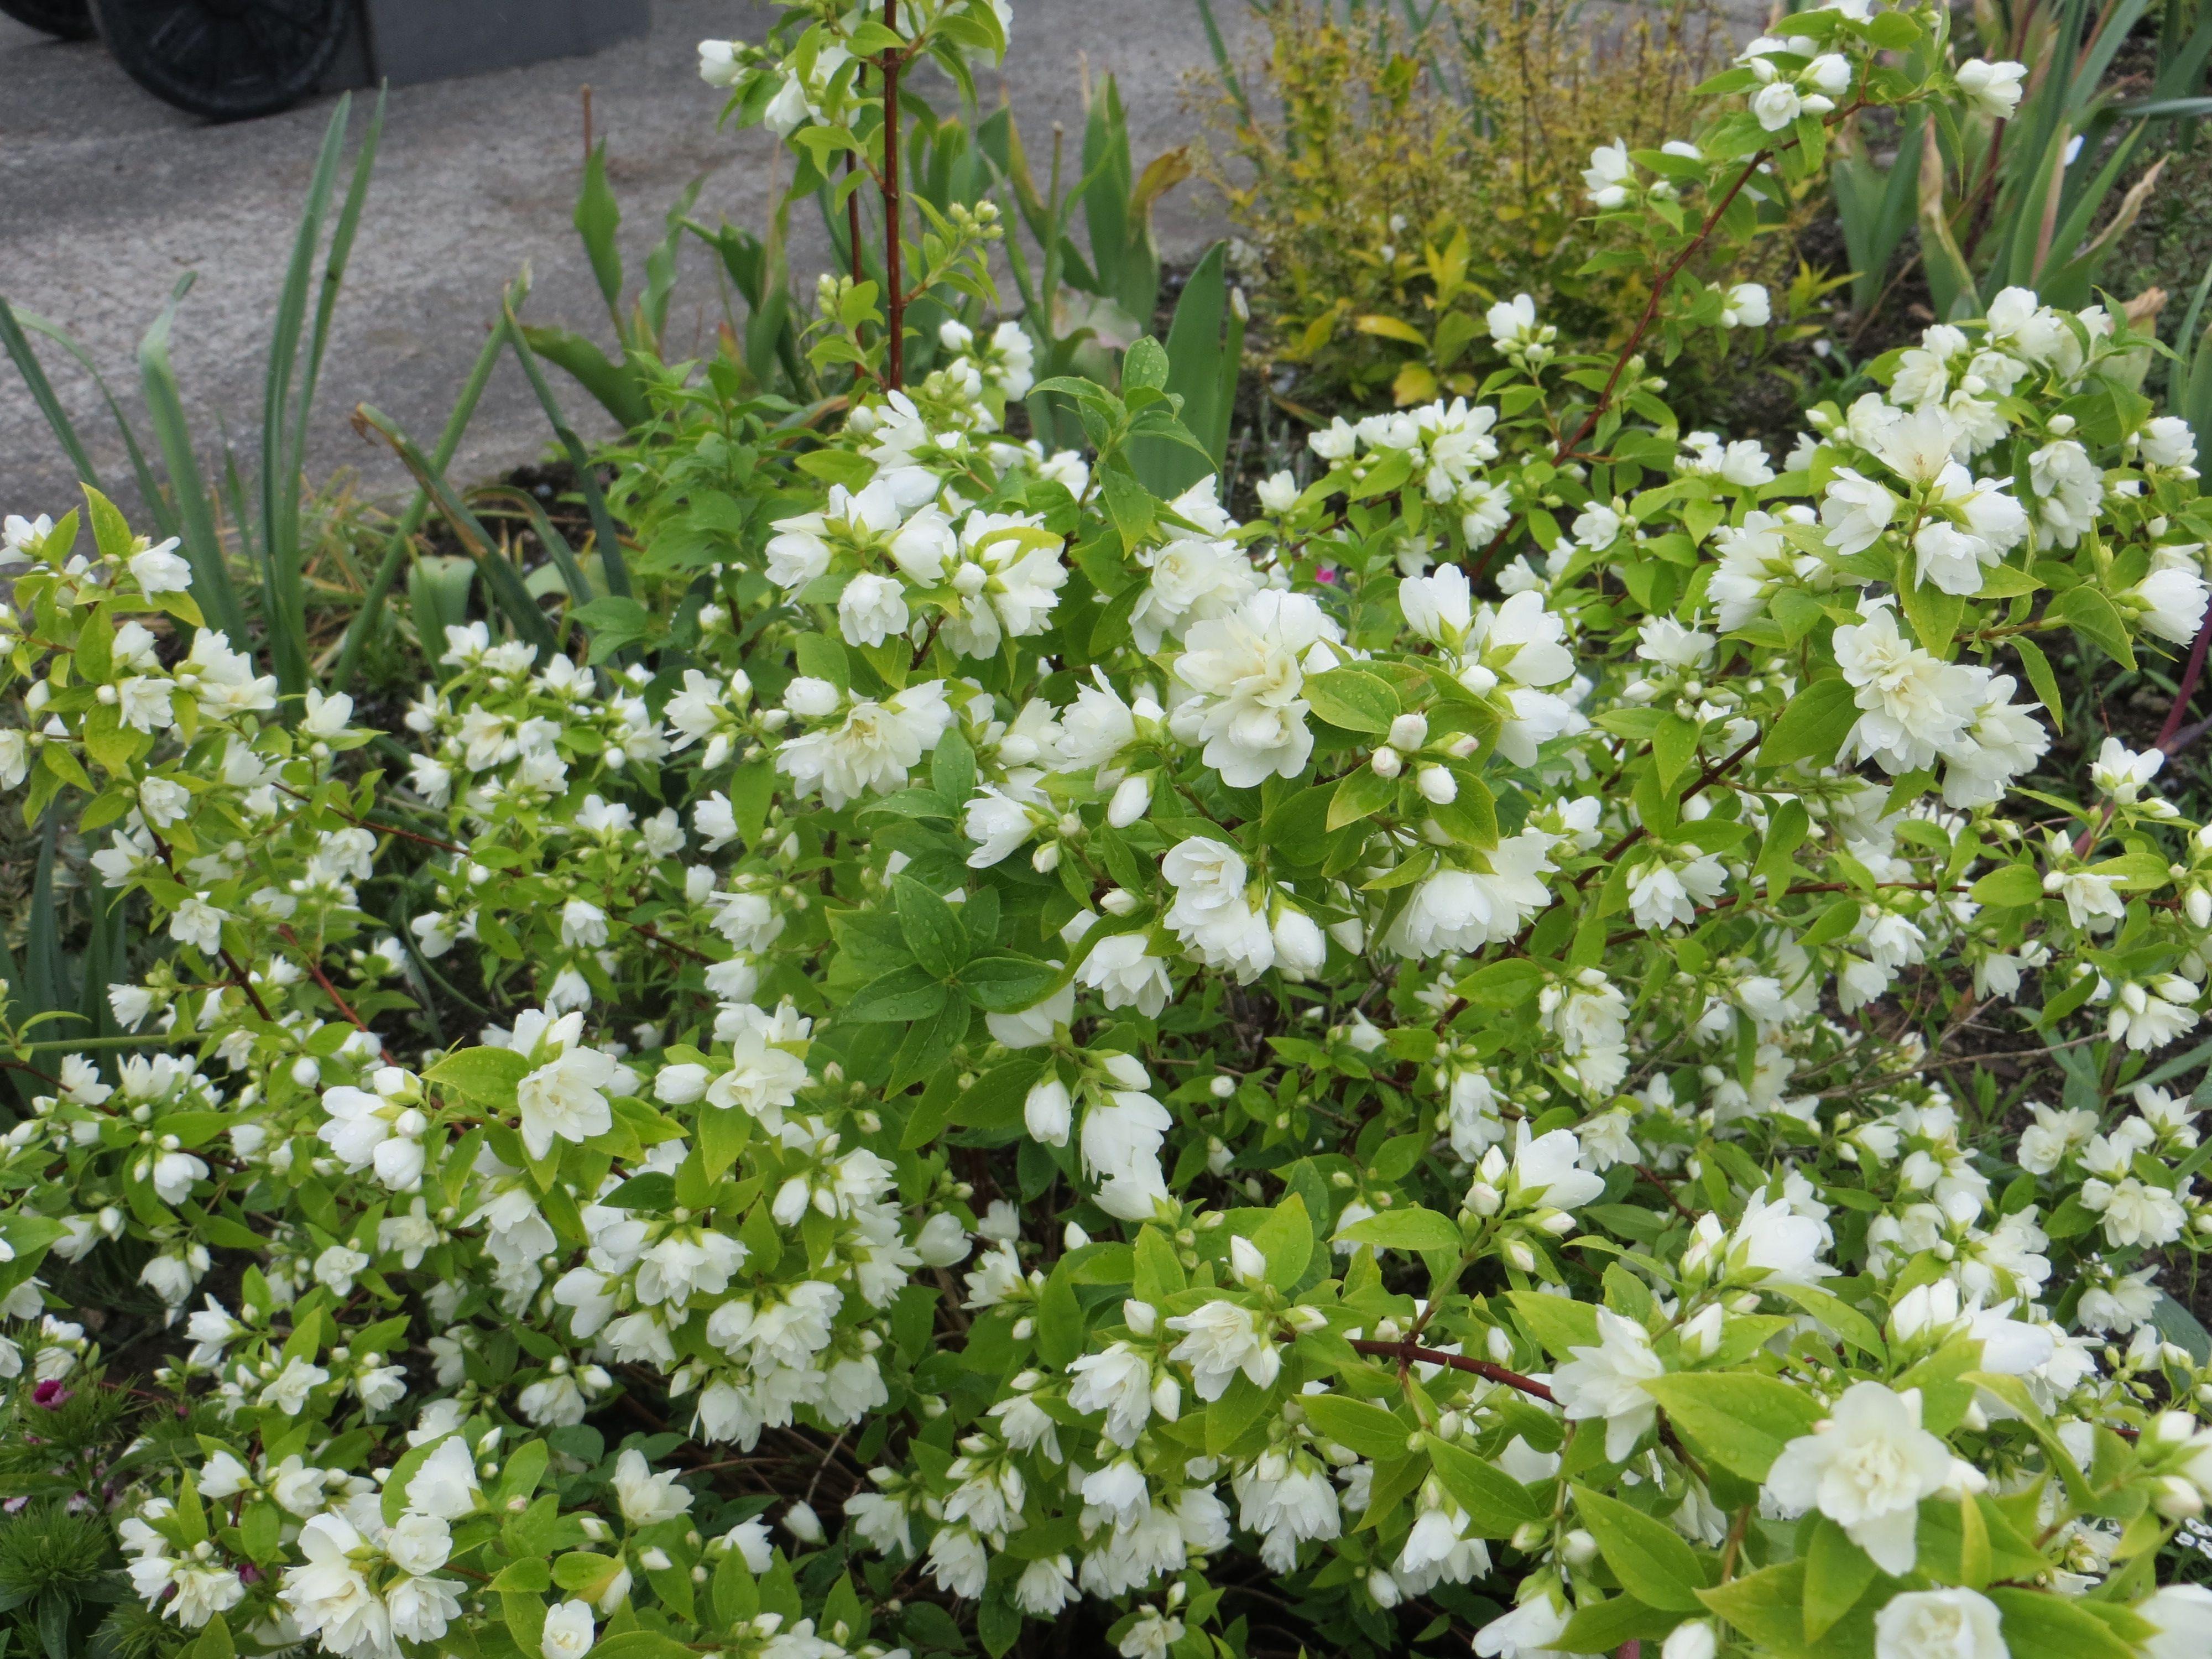 Philadelphus lemoinei 39 manteau d 39 hermine 39 garden home exterior pinterest plants and gardens - Philadelphus manteau d hermine ...